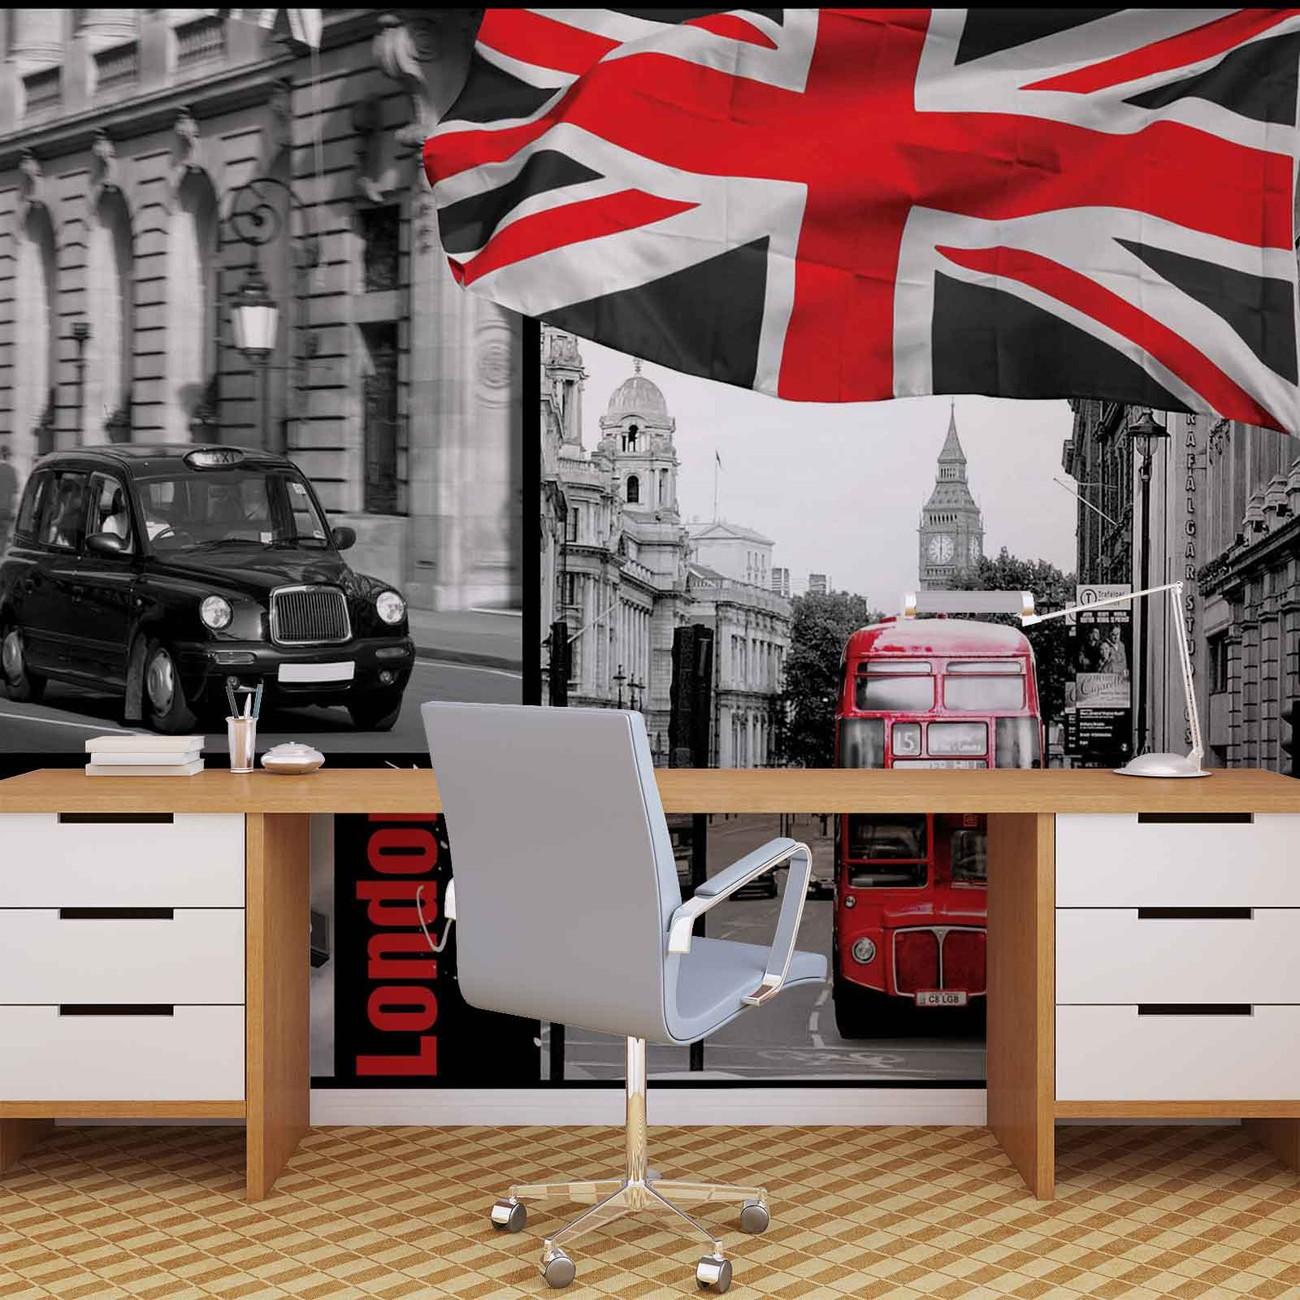 fototapete tapete stadt london bus taxi underground bei europosters kostenloser versand. Black Bedroom Furniture Sets. Home Design Ideas